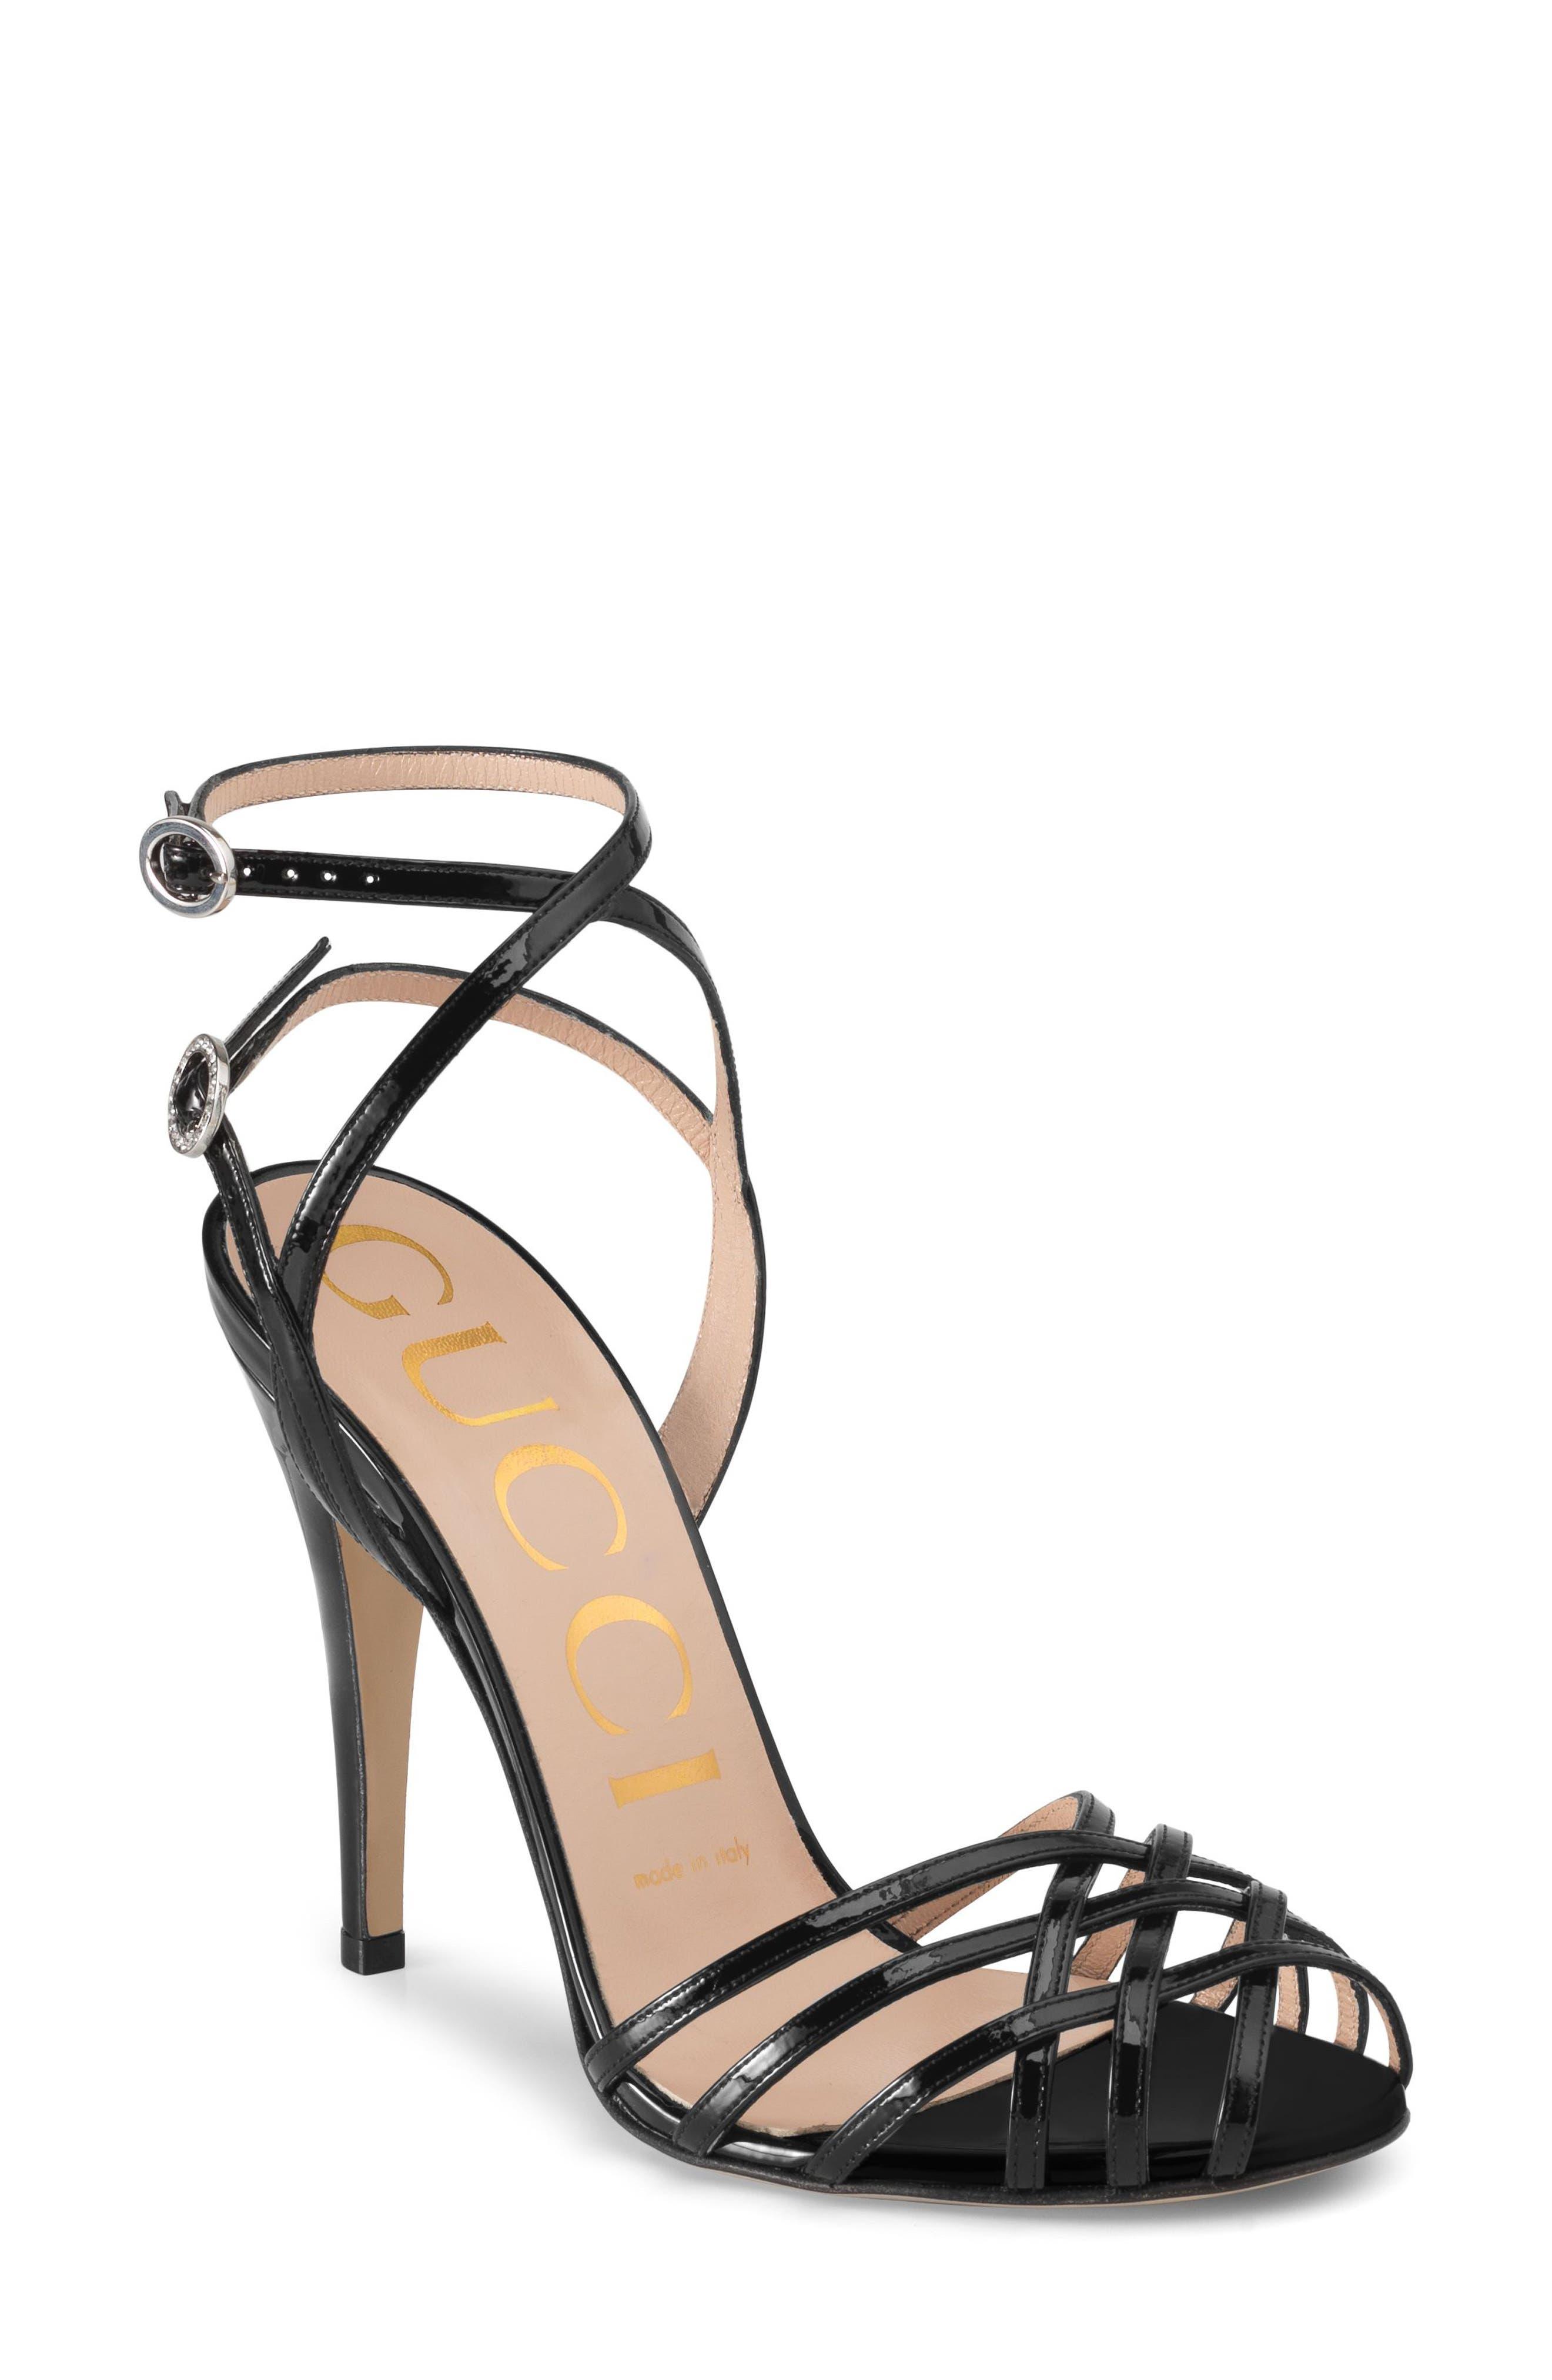 GUCCI, Draconia Ankle Strap Sandal, Main thumbnail 1, color, BLACK